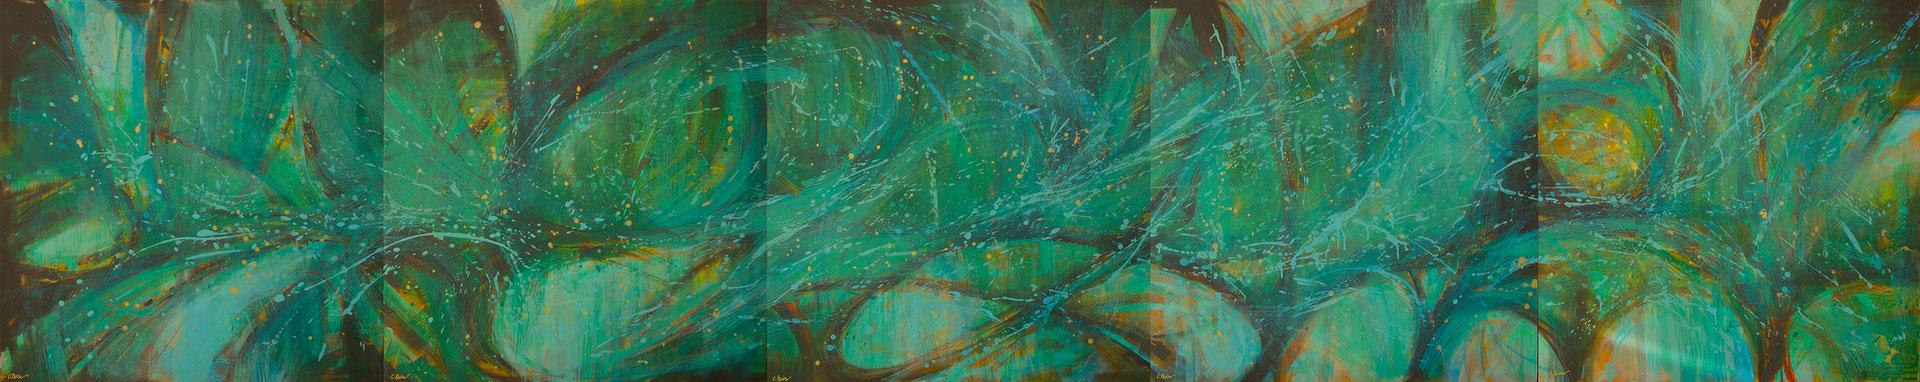 "Polittico ""Grande Vegetalia"", acrilico su tela, cm. 100 x 500"